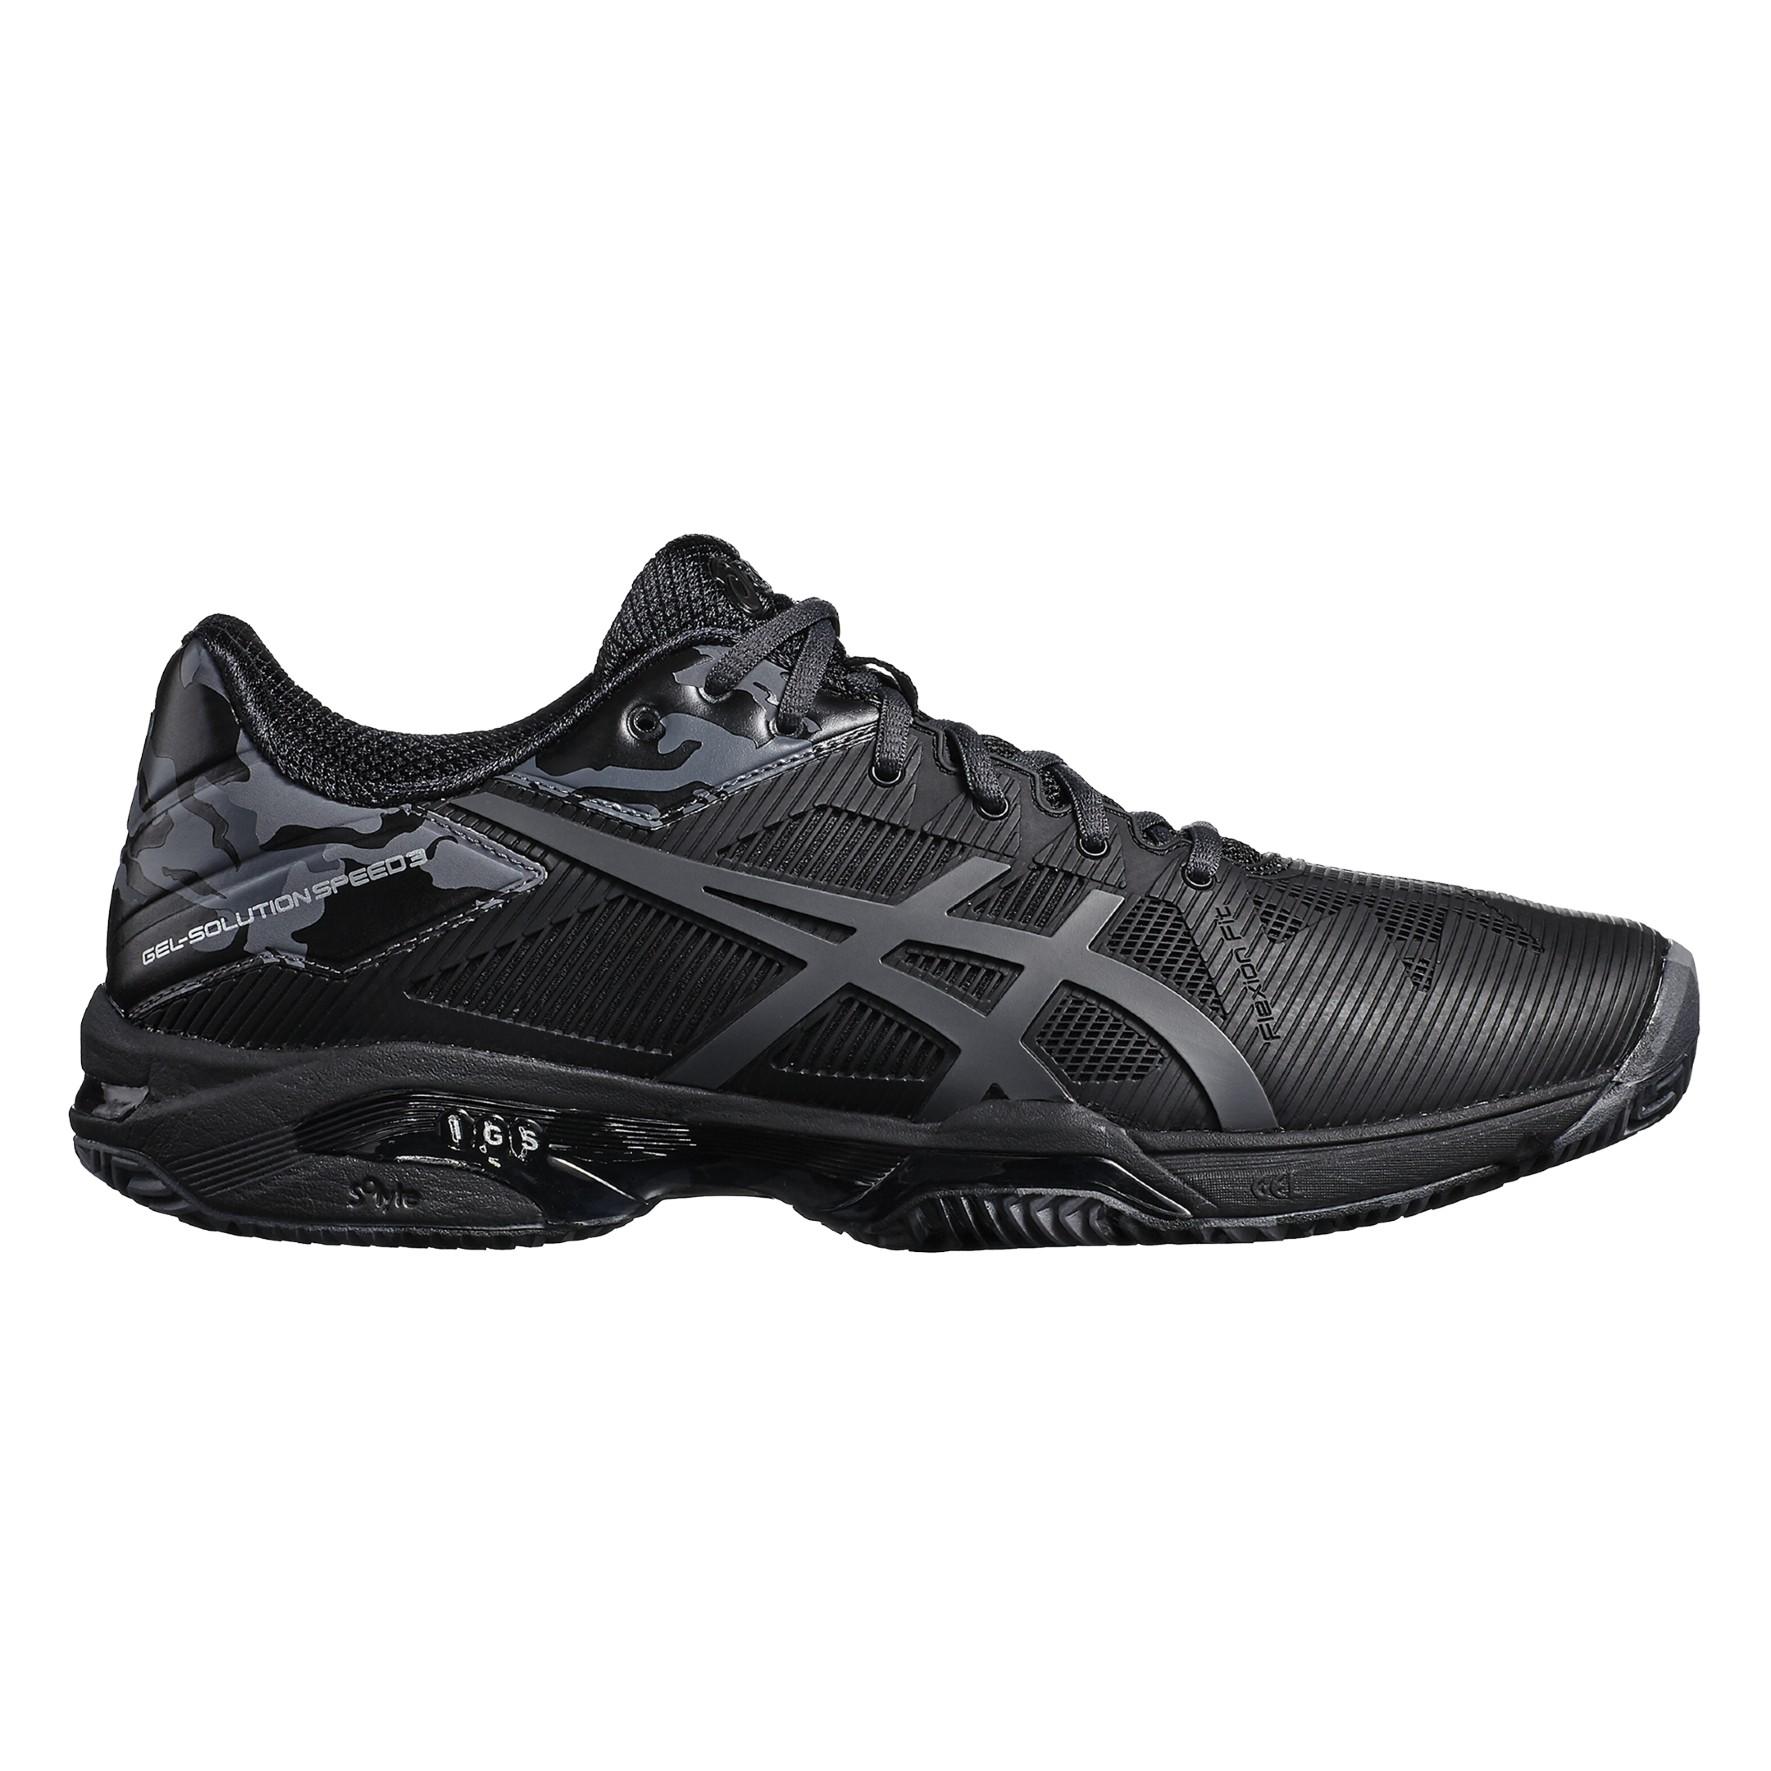 Tenisová obuv Asics Gel Solution Speed 3 Clay L.E. E804N-9095 f2cbed5cb2